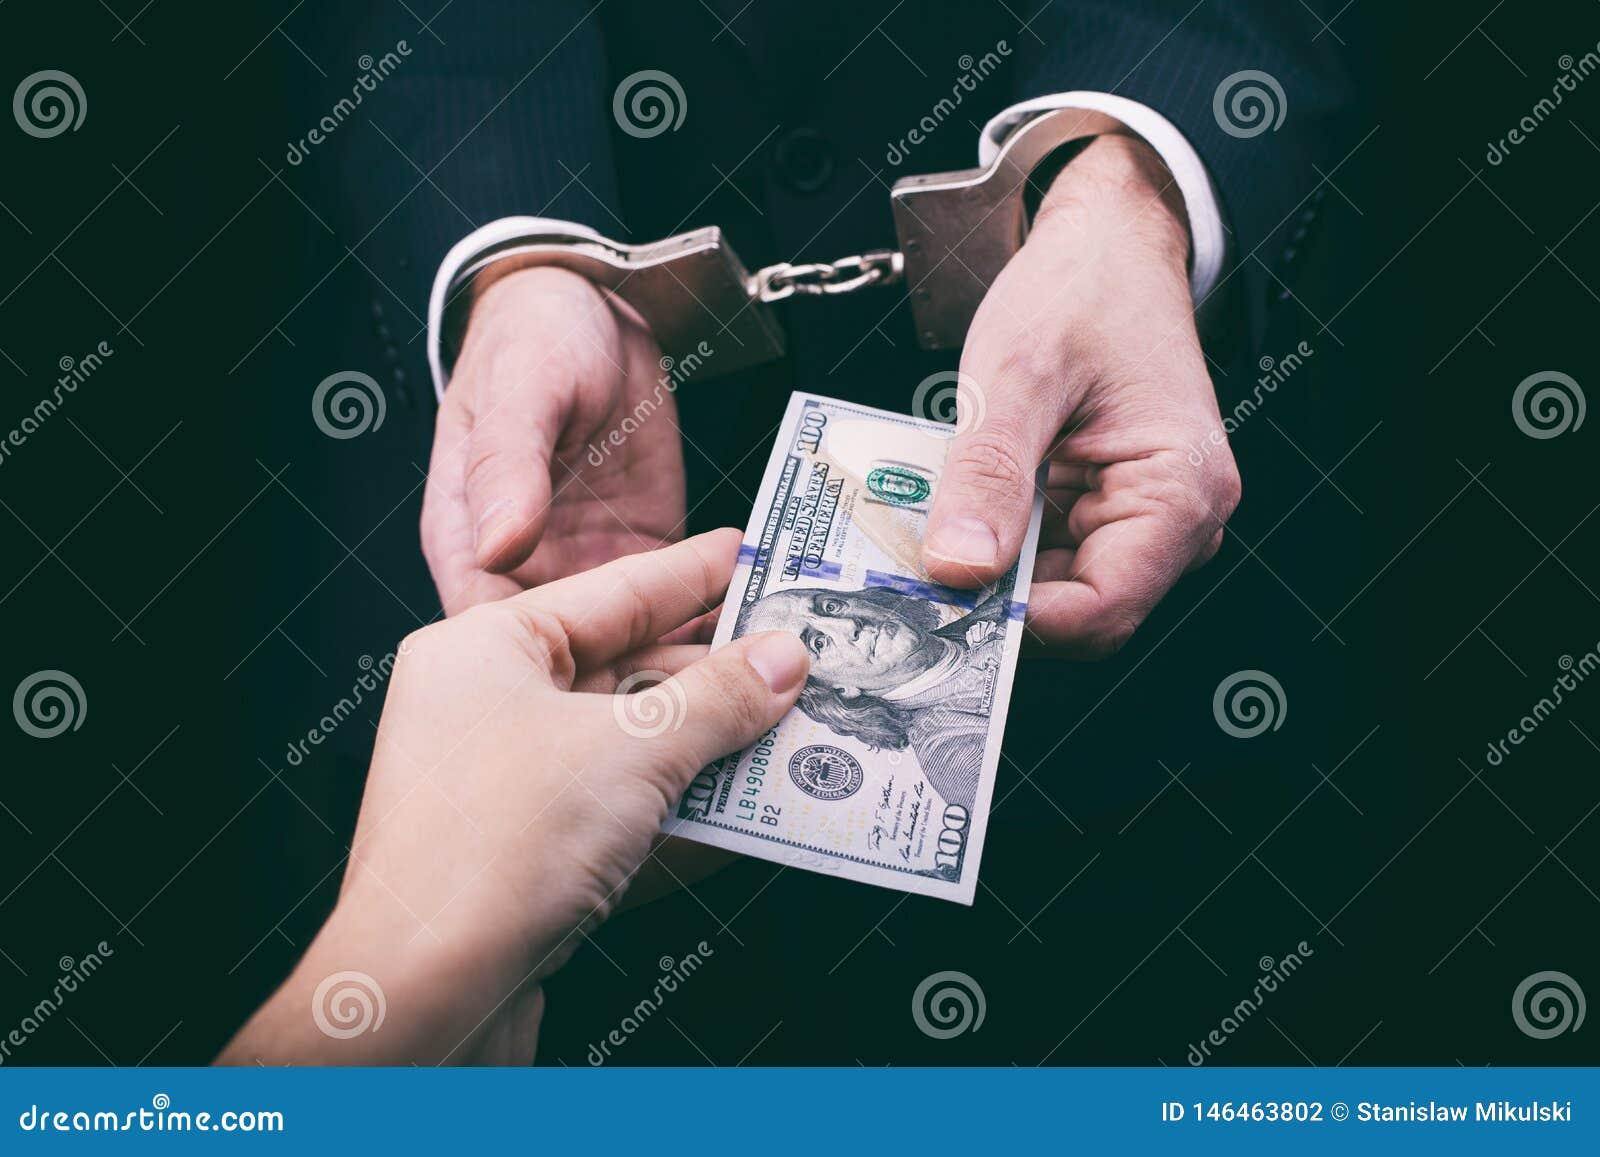 Businessman in handcuffs giving bribe